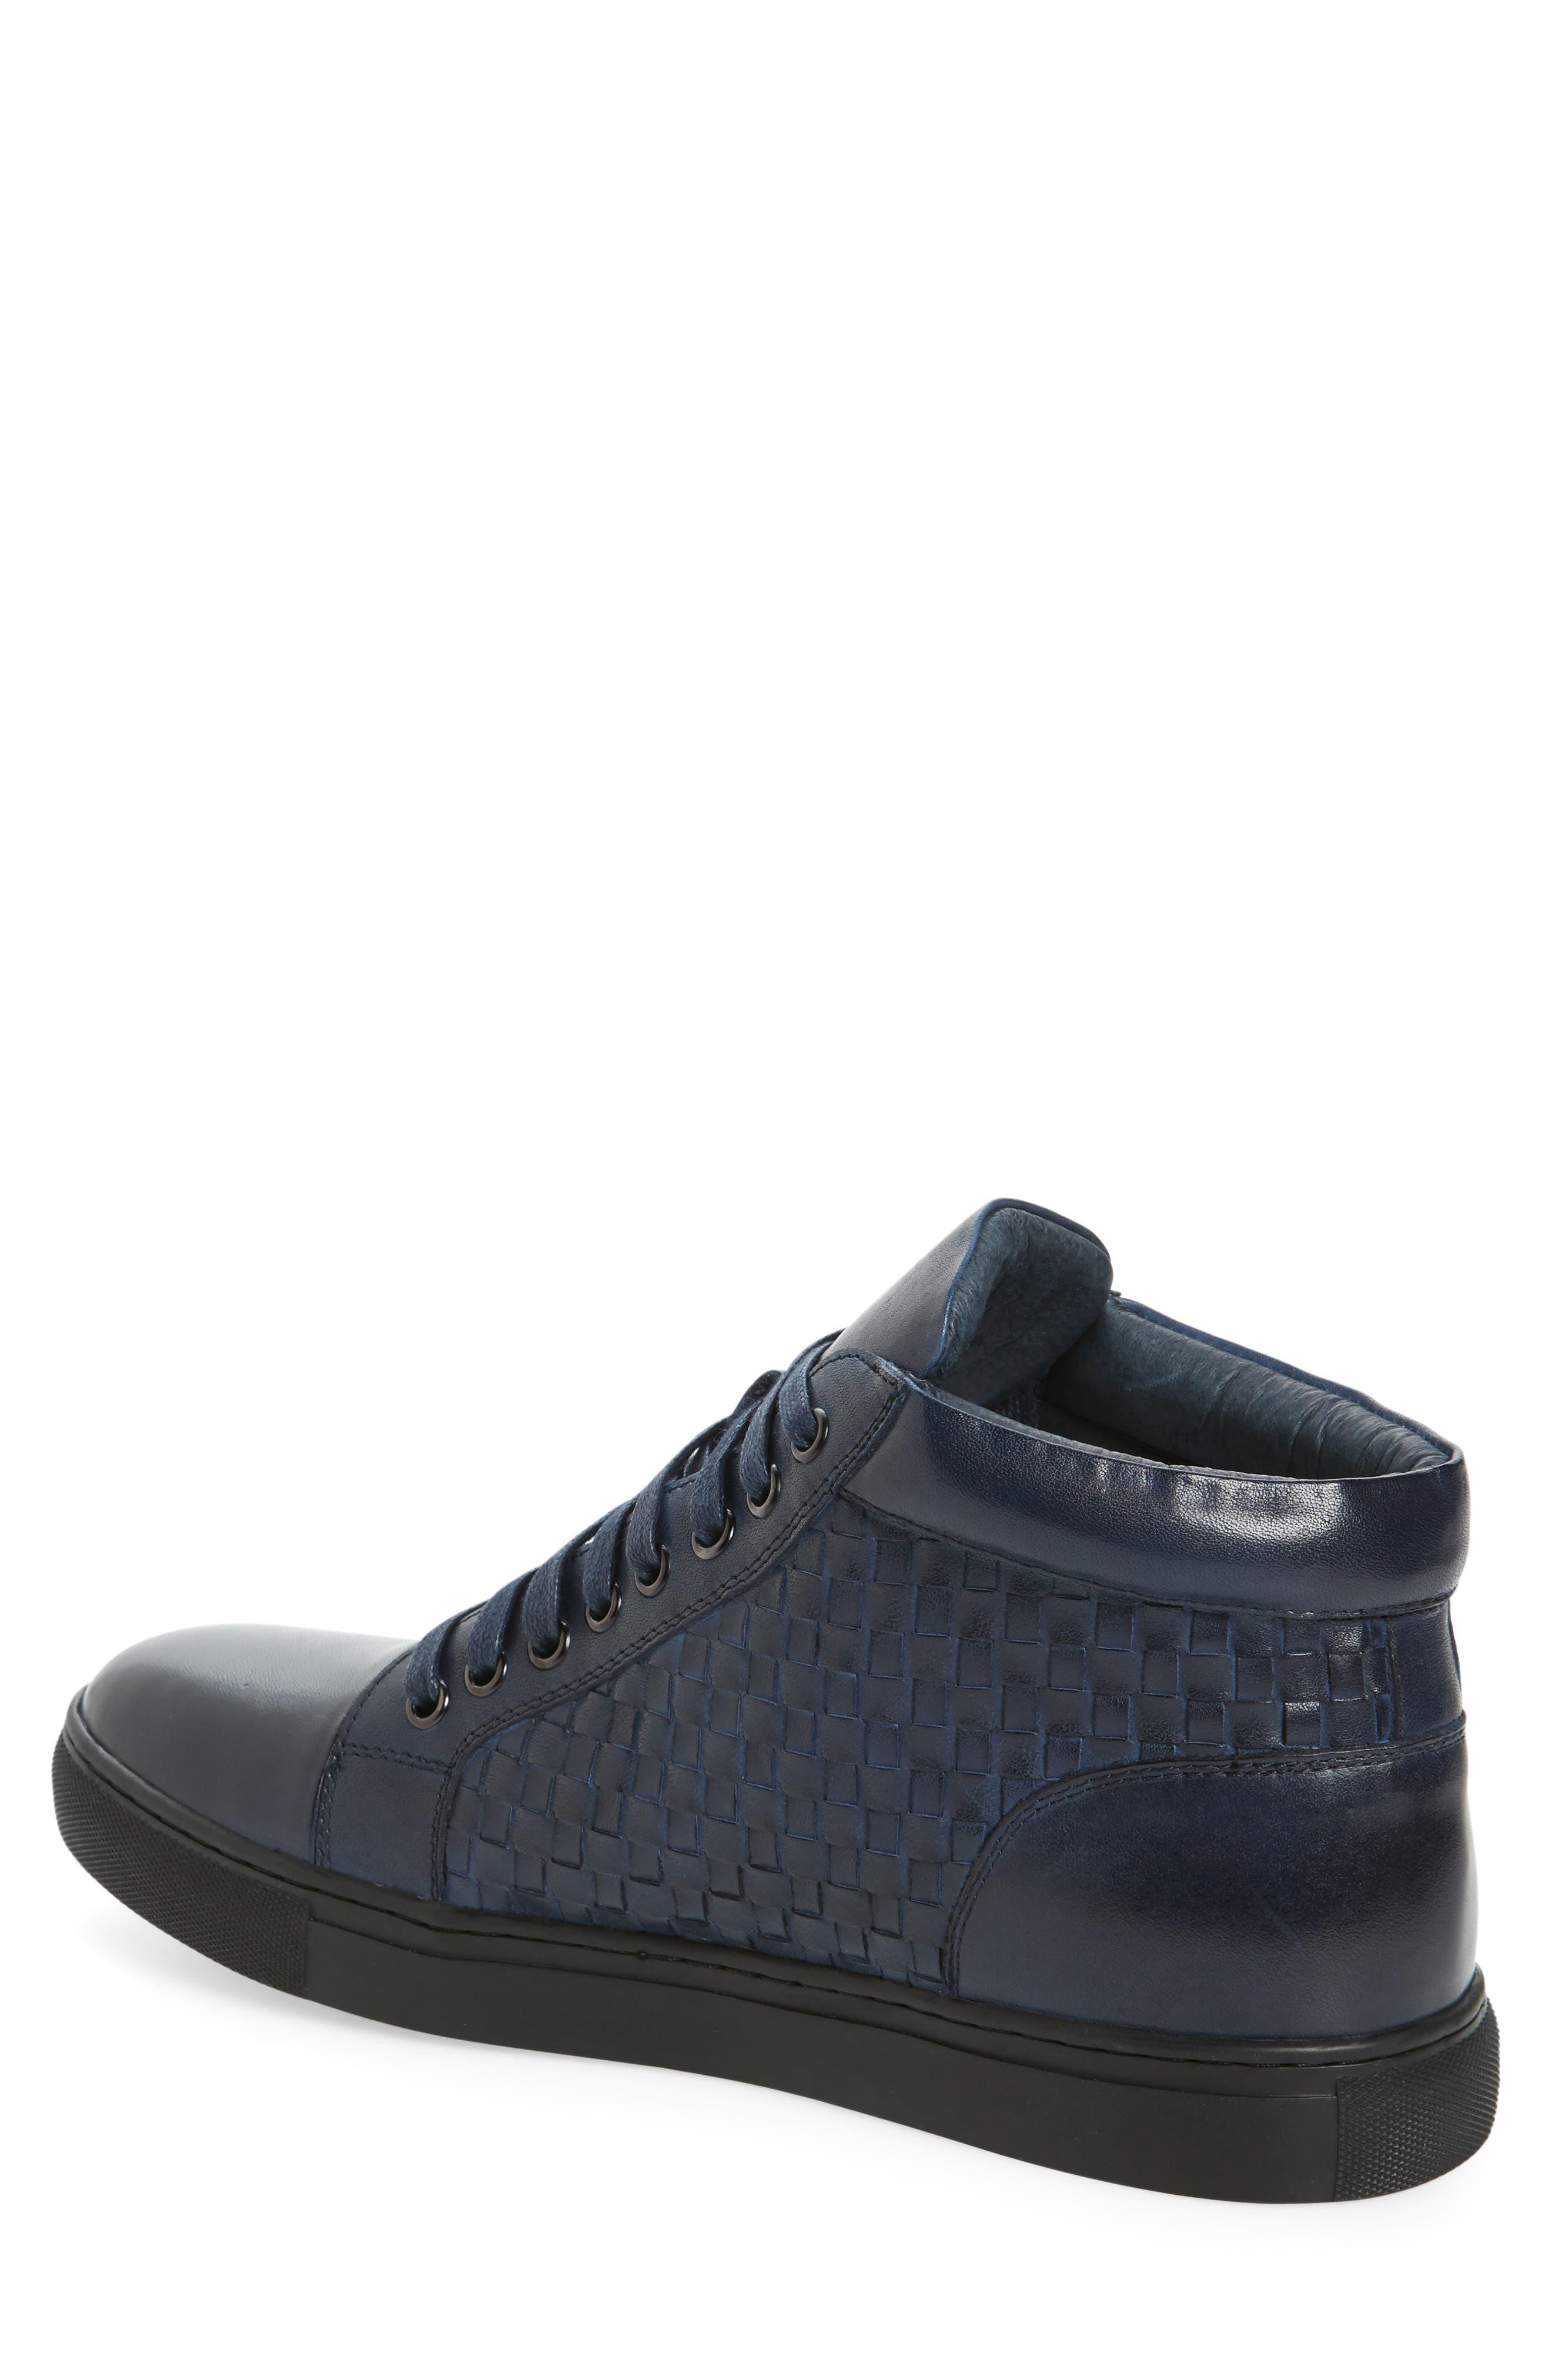 Alternate Image 2  - Zanzara Soul High Top Sneaker (Men)